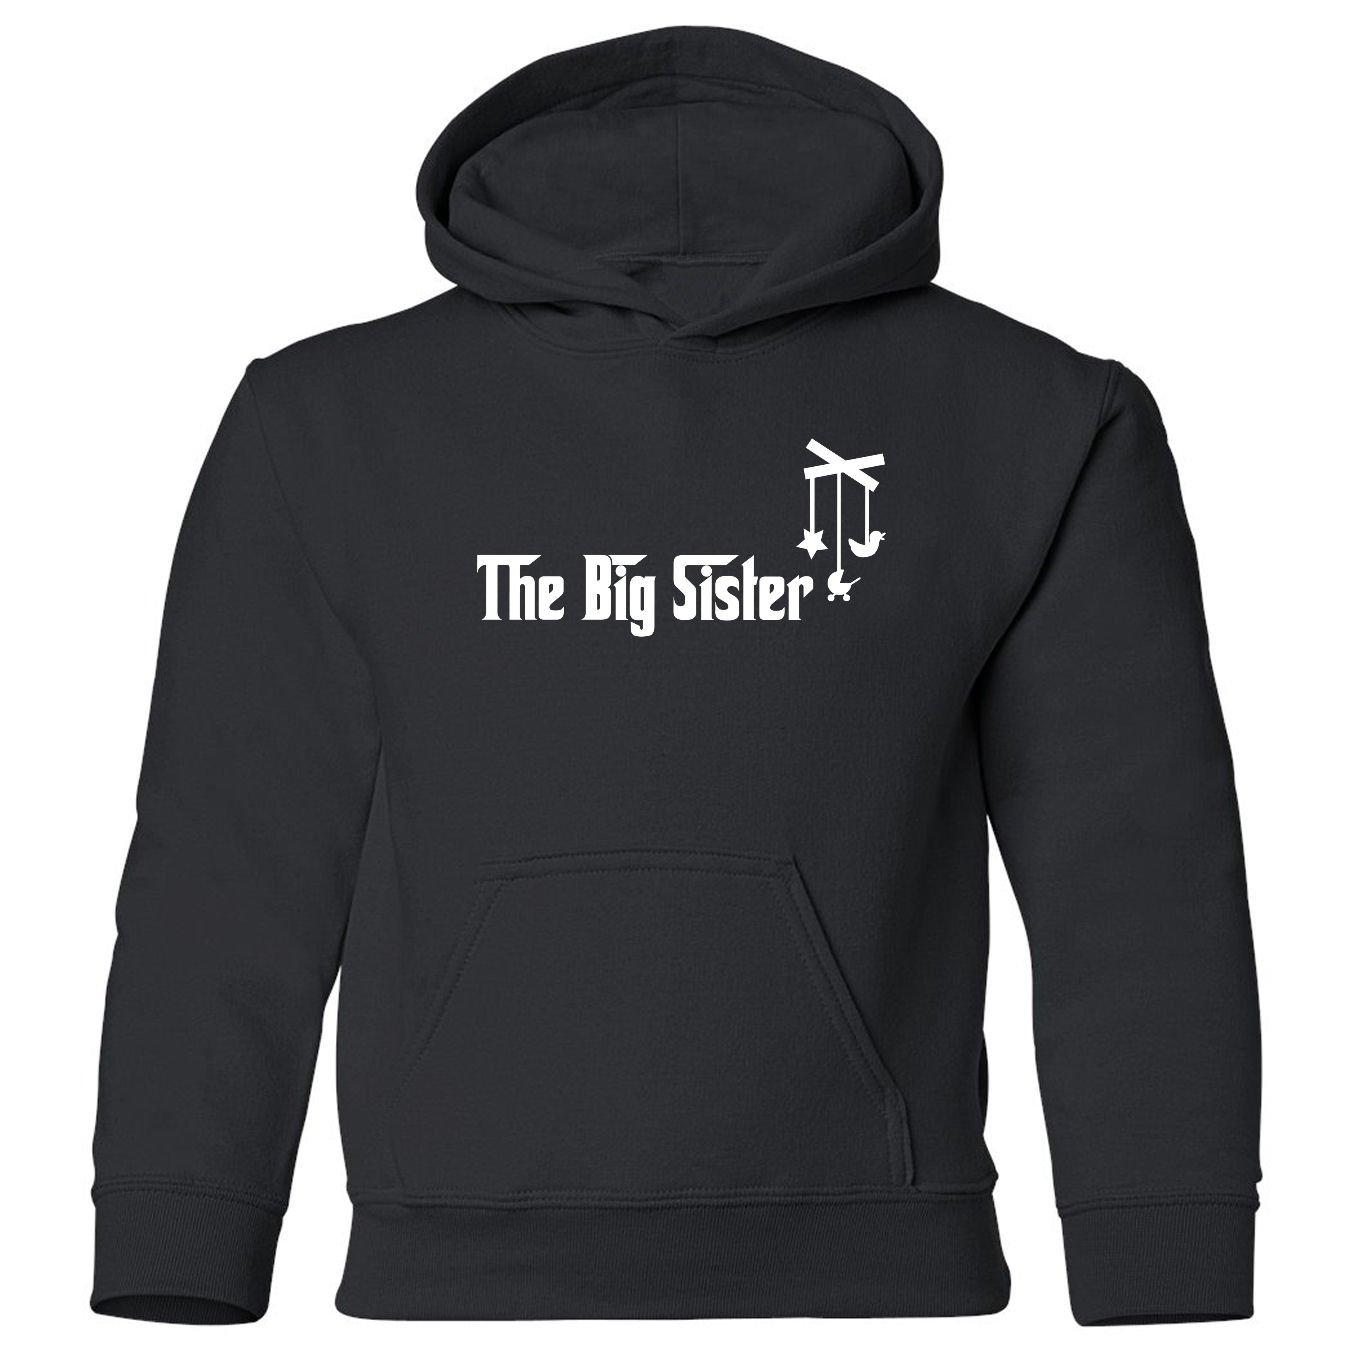 The Big Sister Toddler Hooded Sweatshirt So Relative